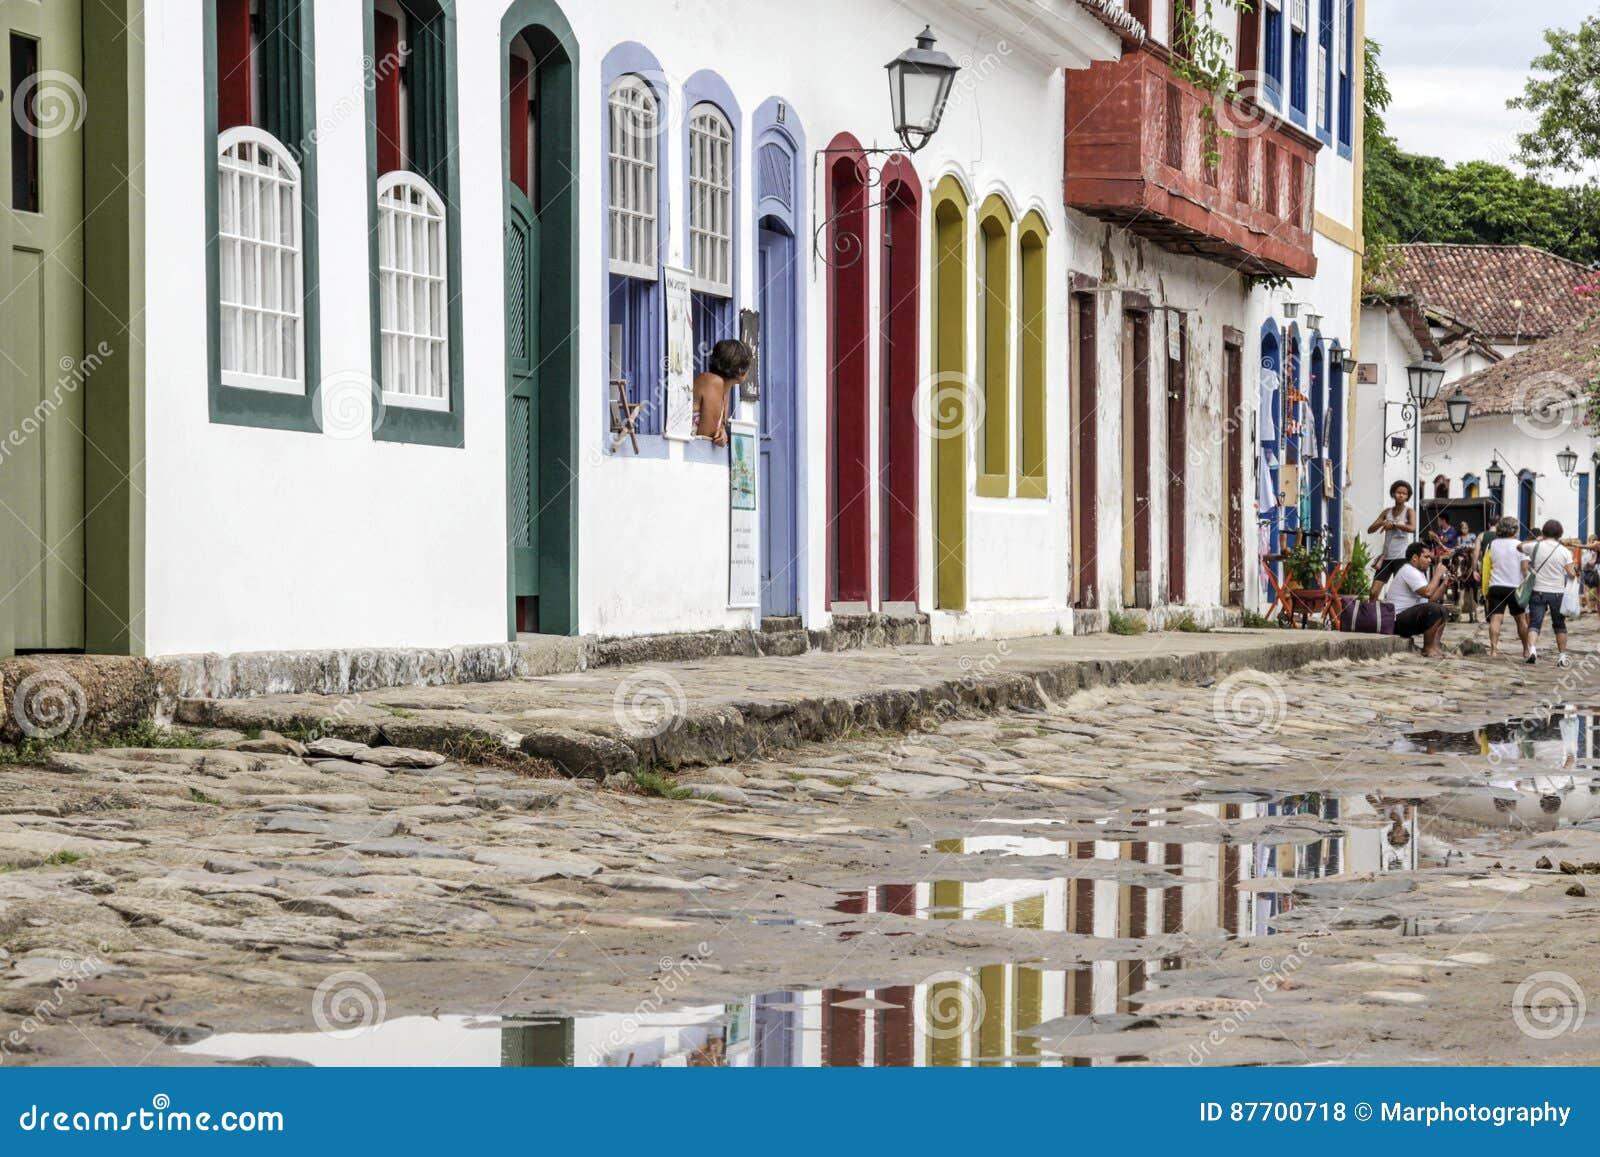 Bâtiment historique de Paraty en Rio de Janeiro Brazil